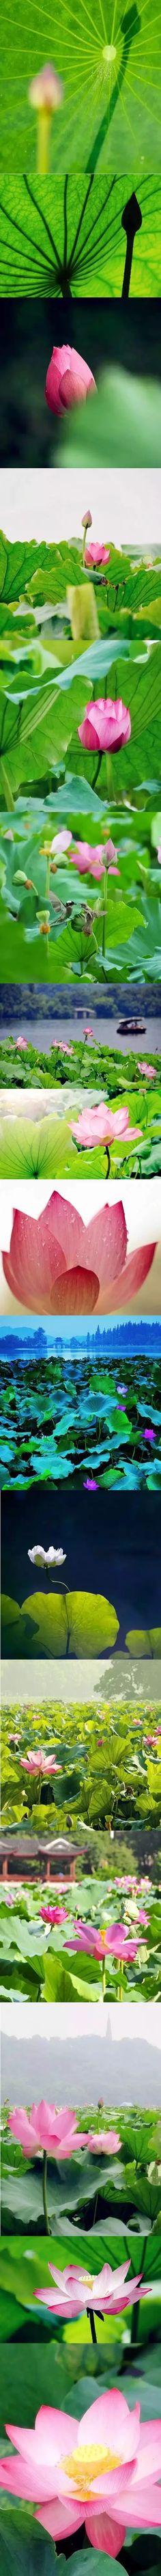 The manifold beautiful portraits of the lotus flower in Hangzhou in the summer. #travelogue #travel #Hangzhou #beautiful #scenary #photography  #gorgeous #romantic #urbanlife #urbanite #city #citylife #WestLake #lotus #flowers